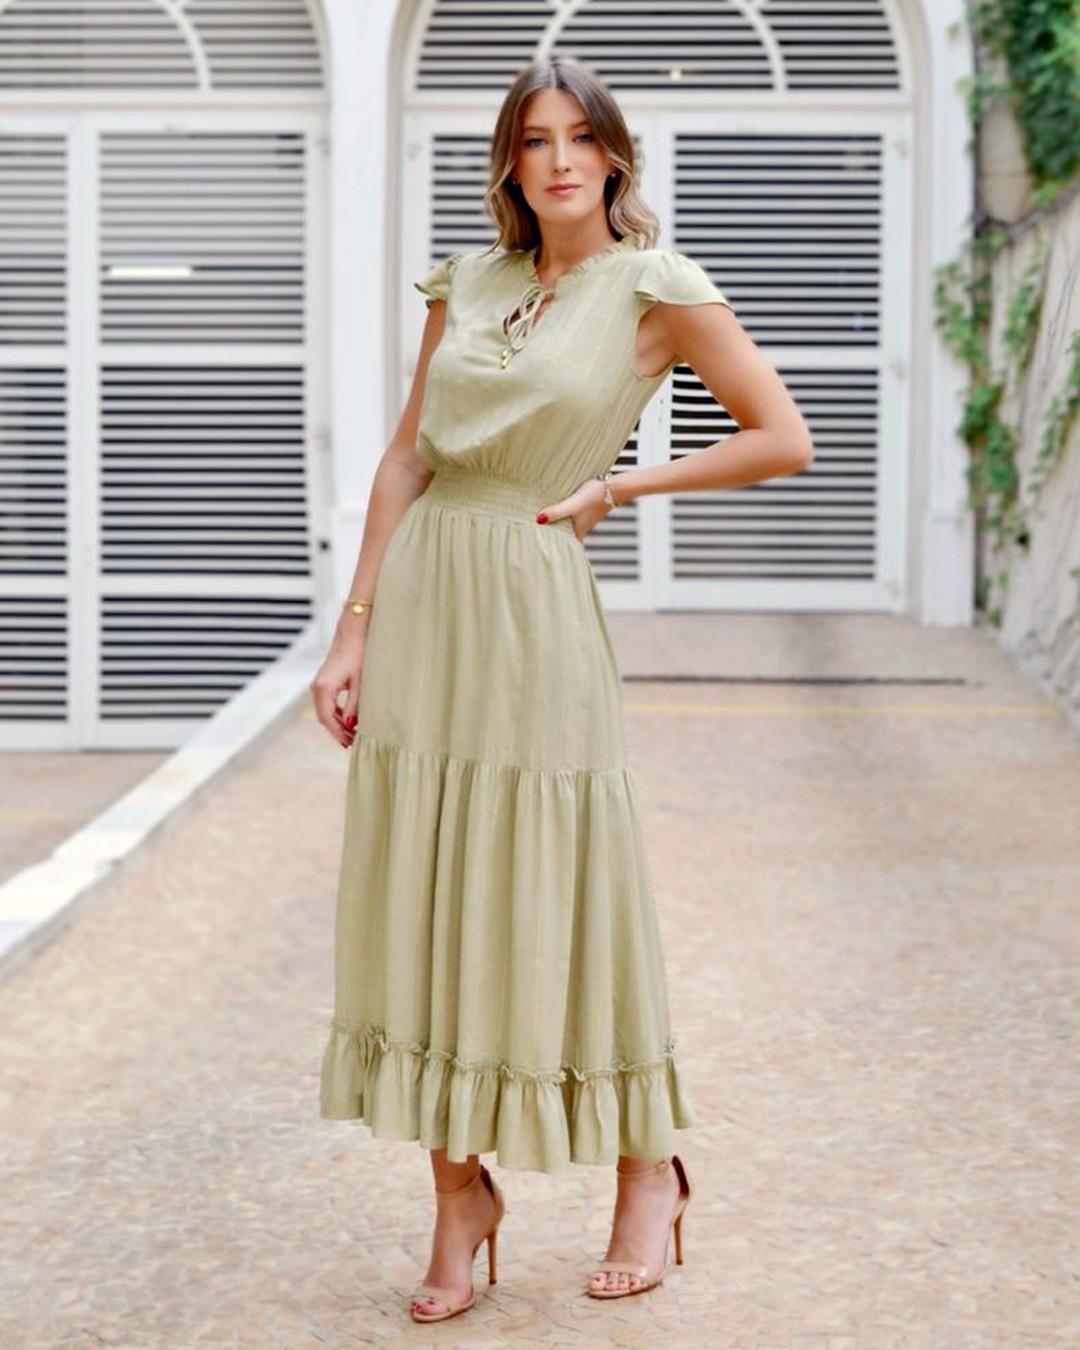 Vestido Maxi Midi Soltinho com Lastex Milalai Ariane